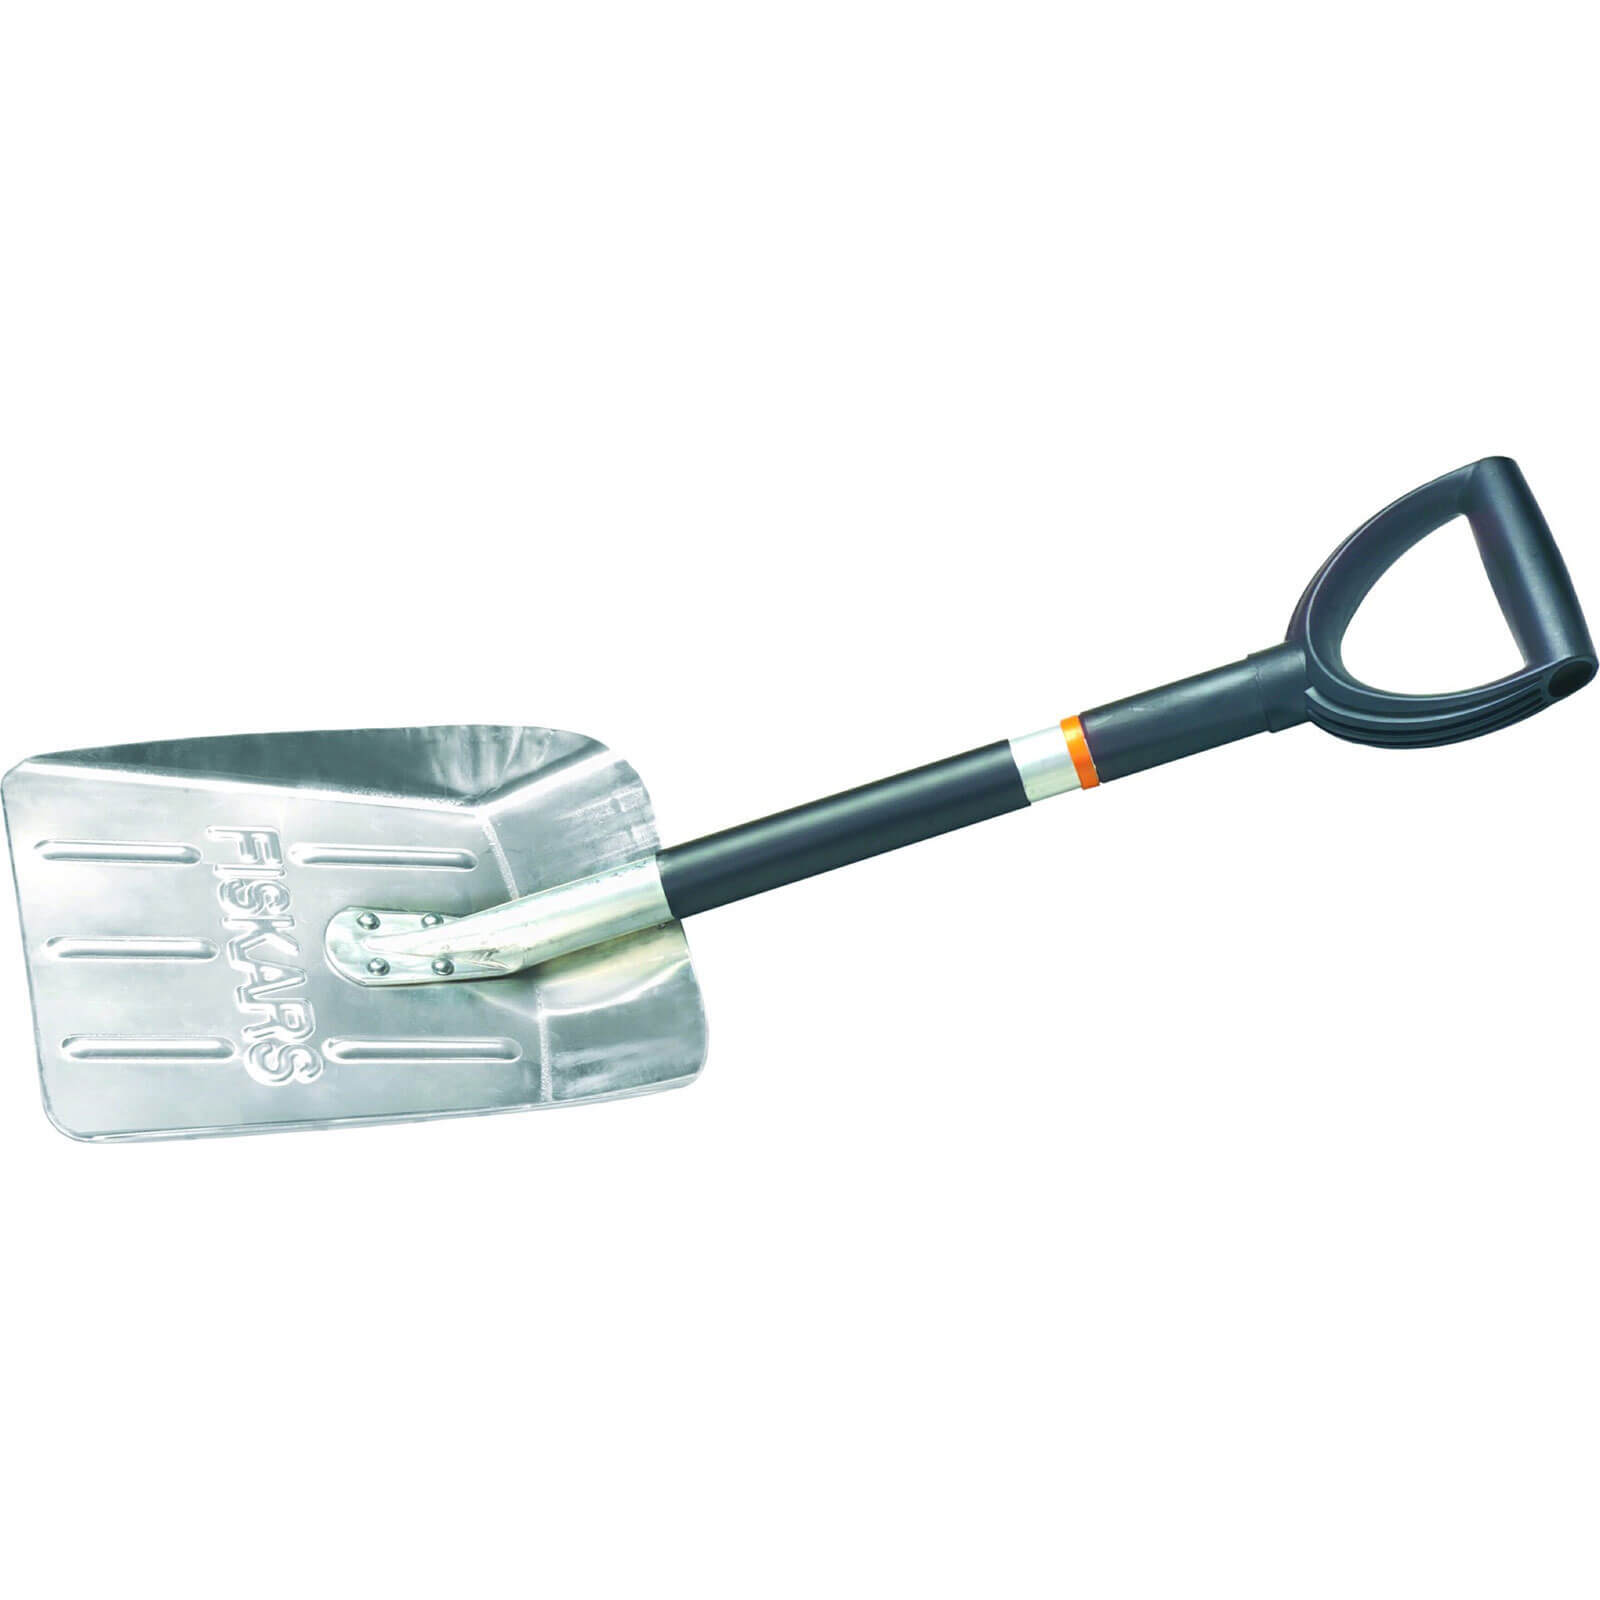 Fiskars Car Snow Shovel